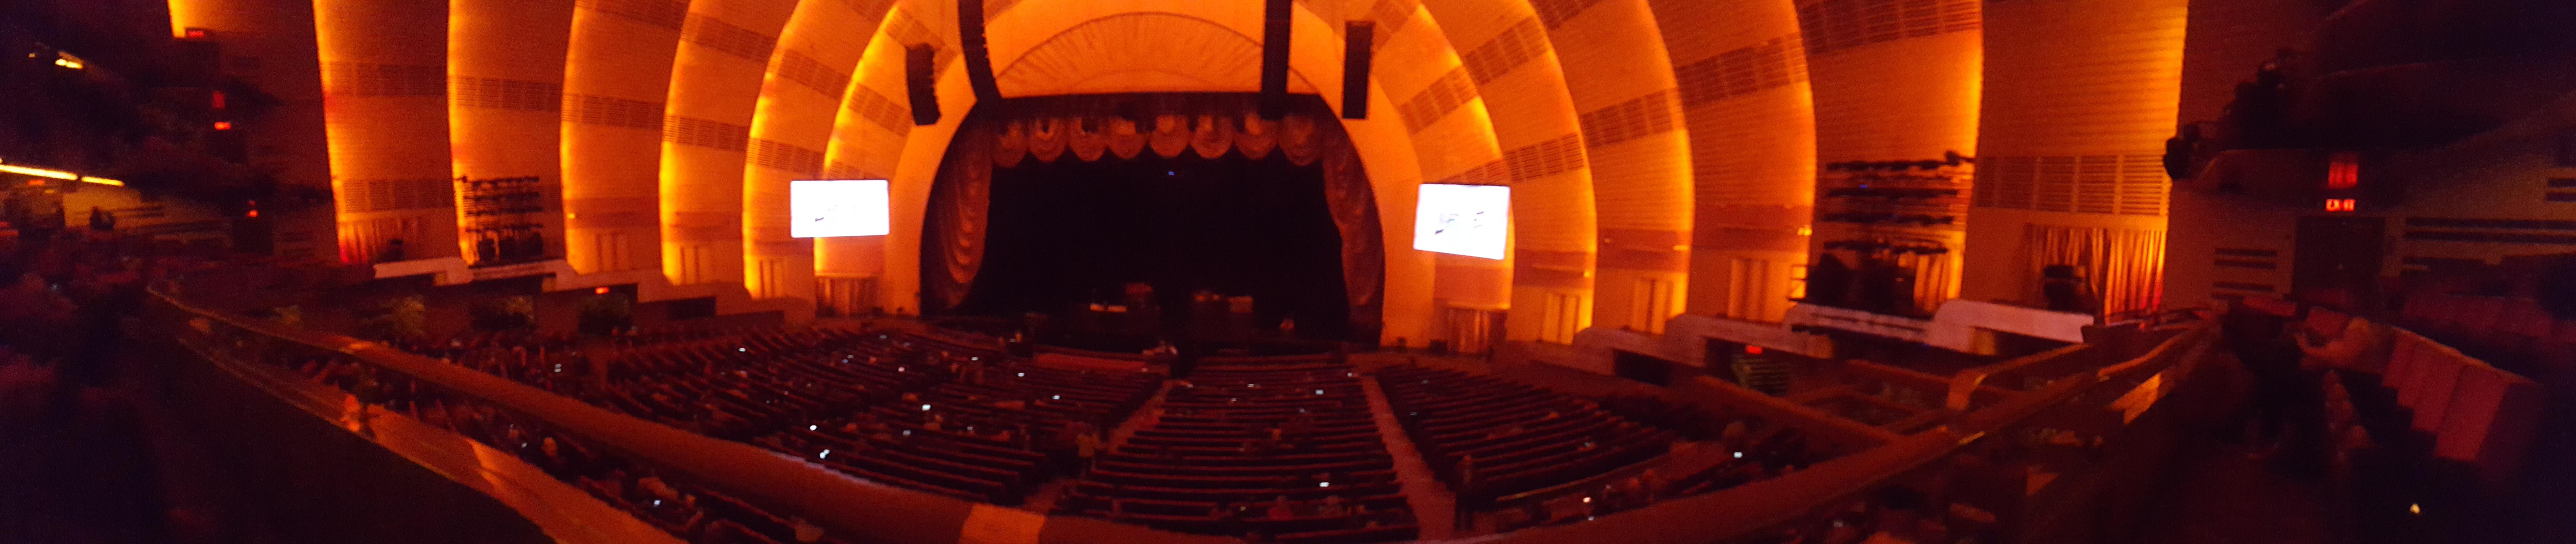 Radio City Music Hall Section 1st Mezzanine 3 Row A Seat 303